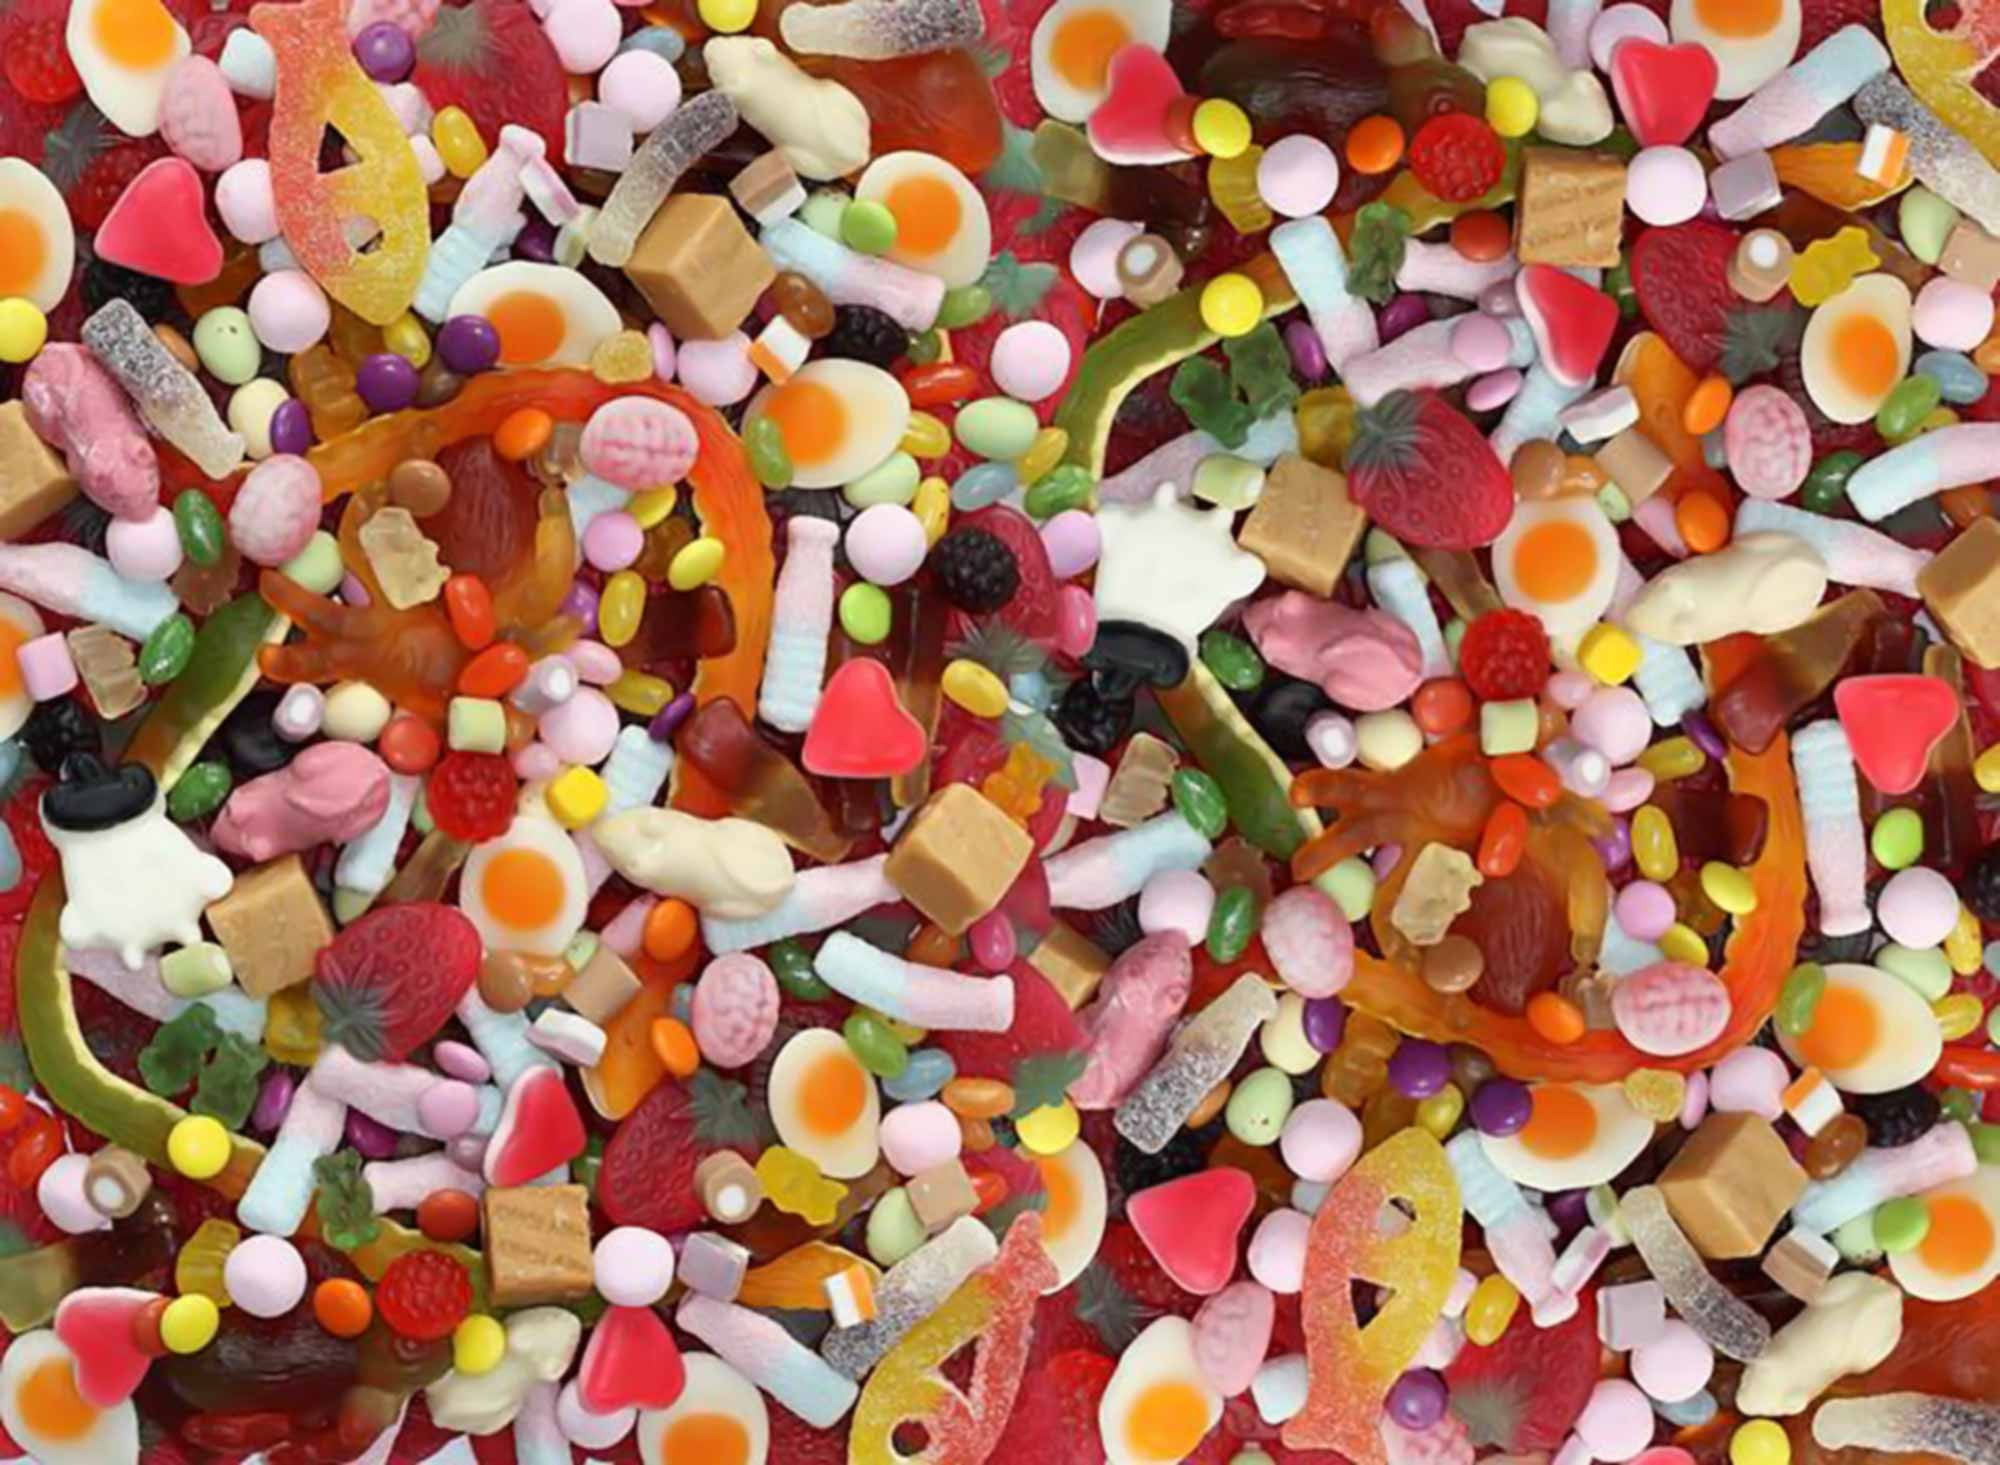 Cloetta - Candyking Sweets